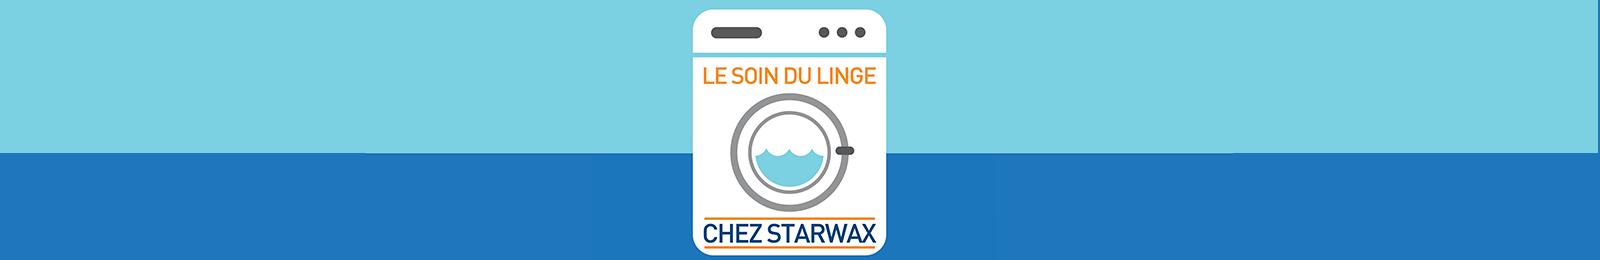 Banniere-Infographie-Soin-du-linge-chez-Starwax